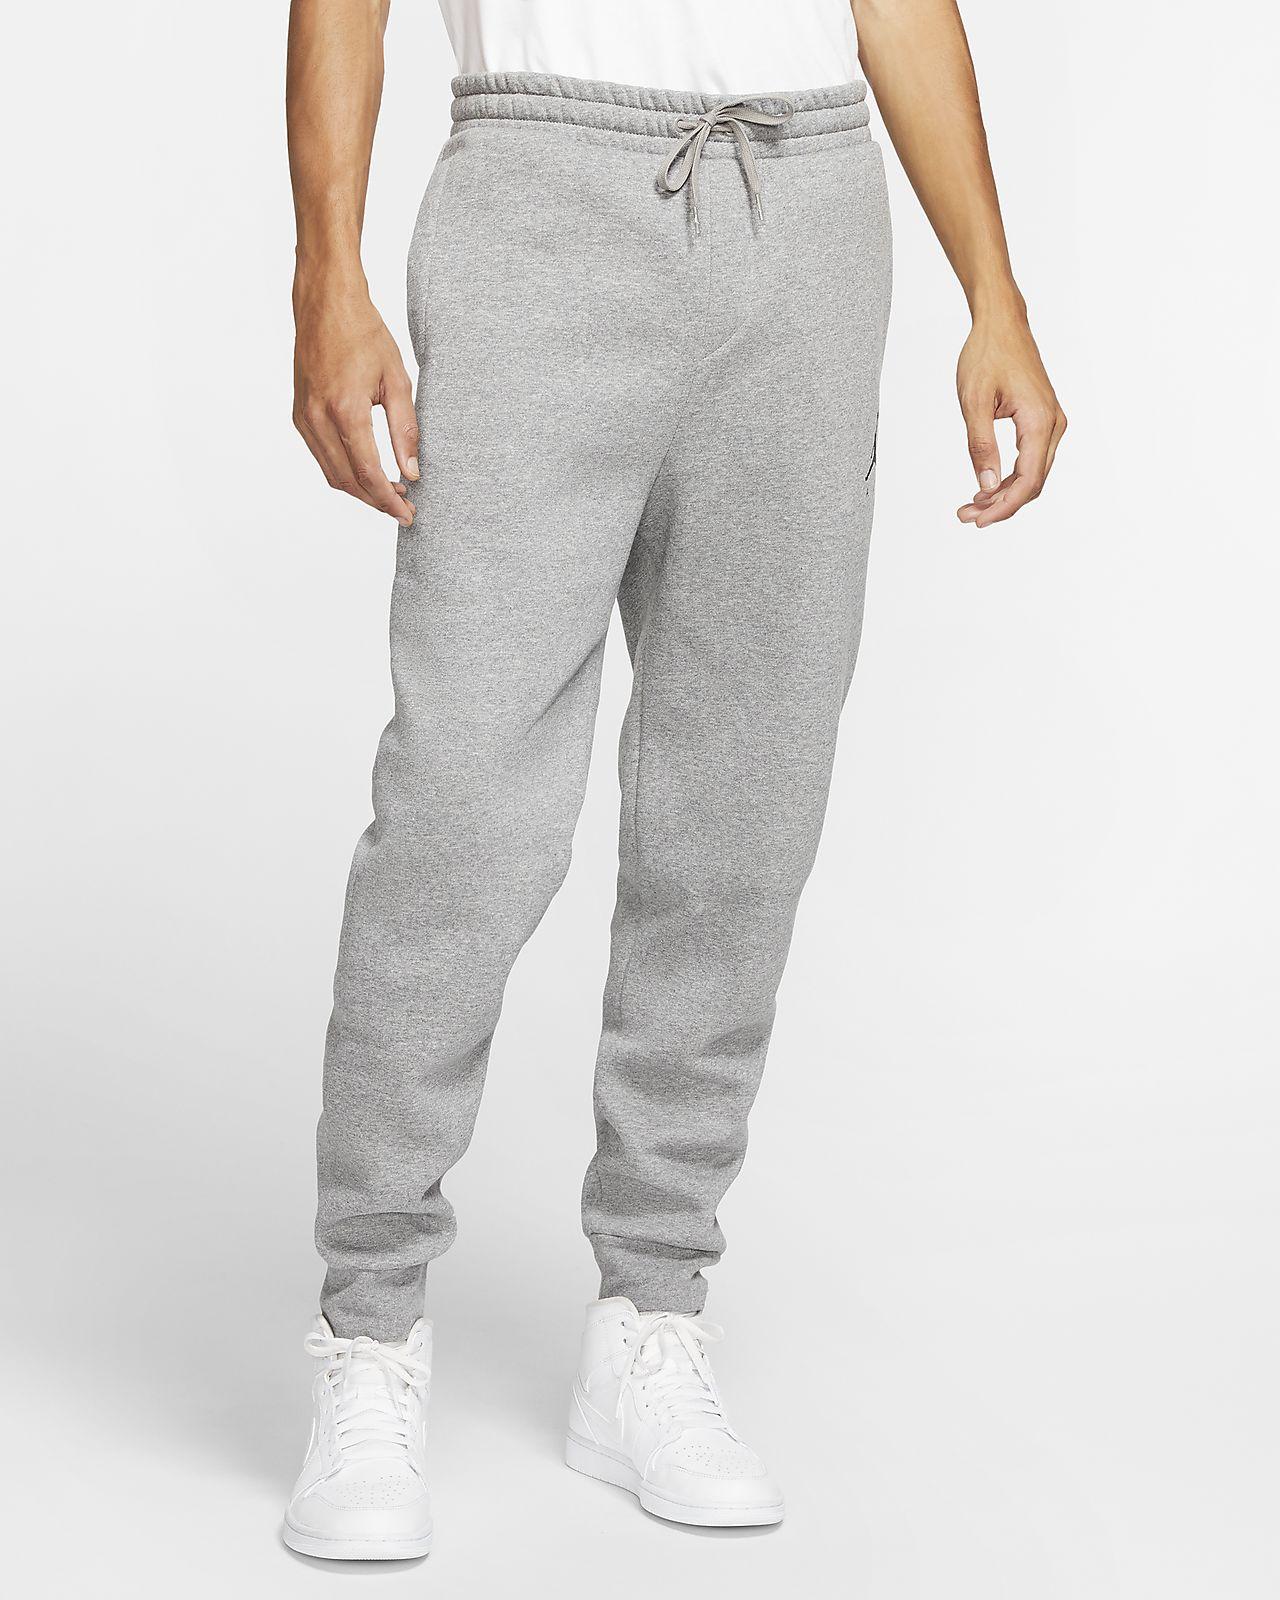 Jordan Jumpman Air Men's Fleece Trousers